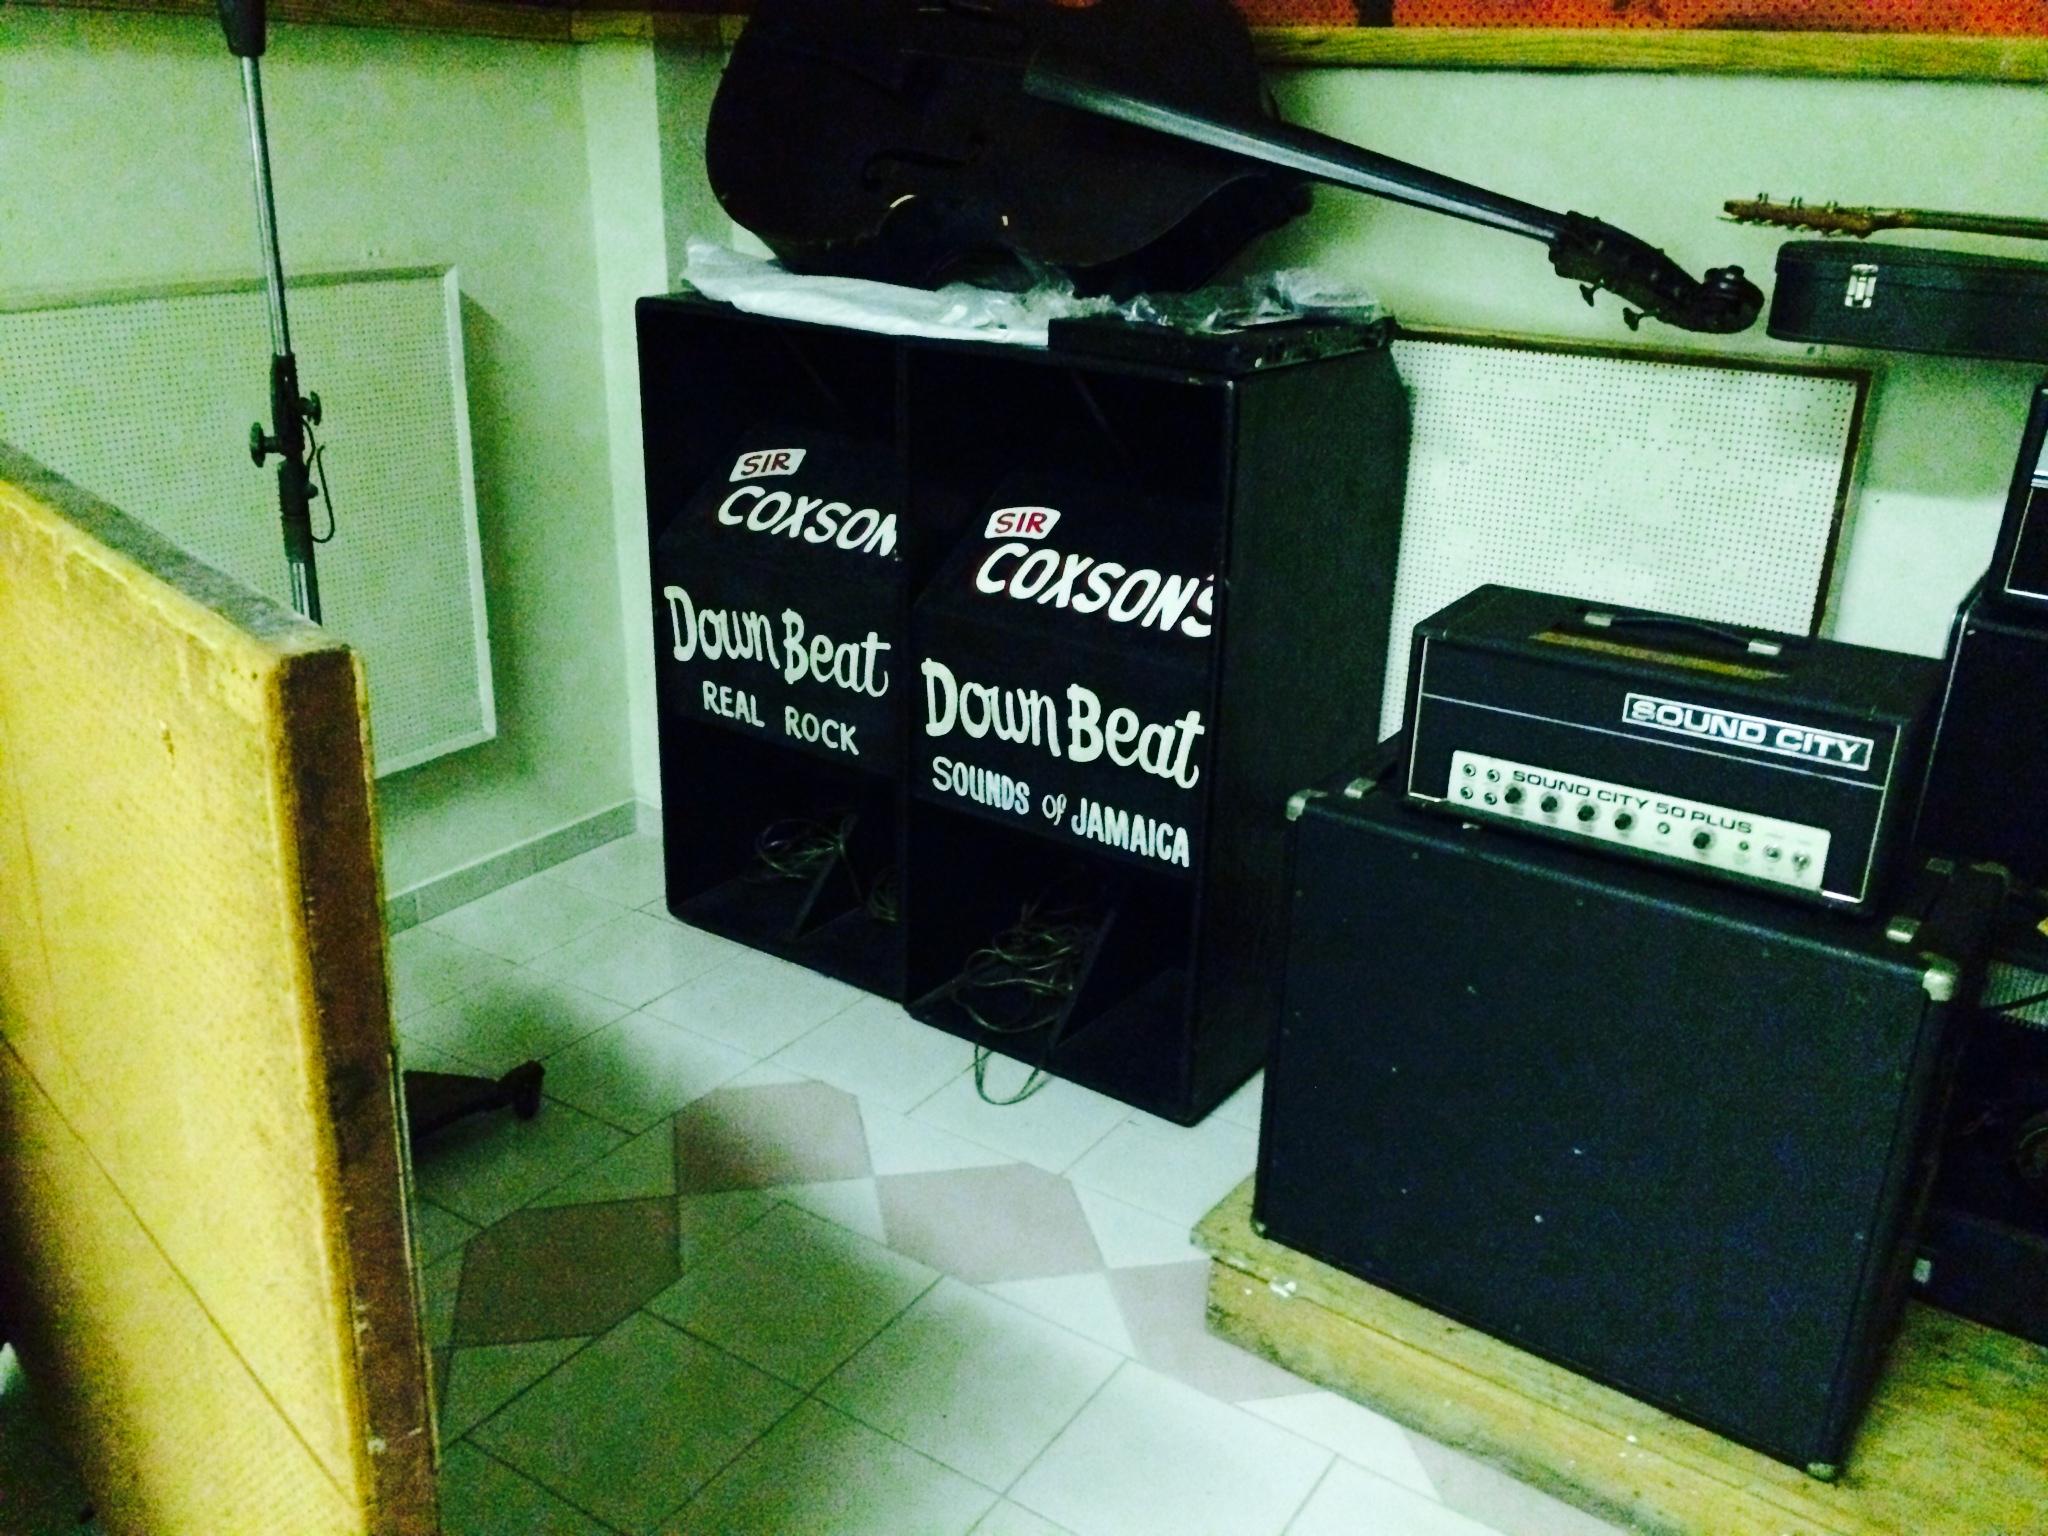 Coxsone Downbeat Sound System Equipment